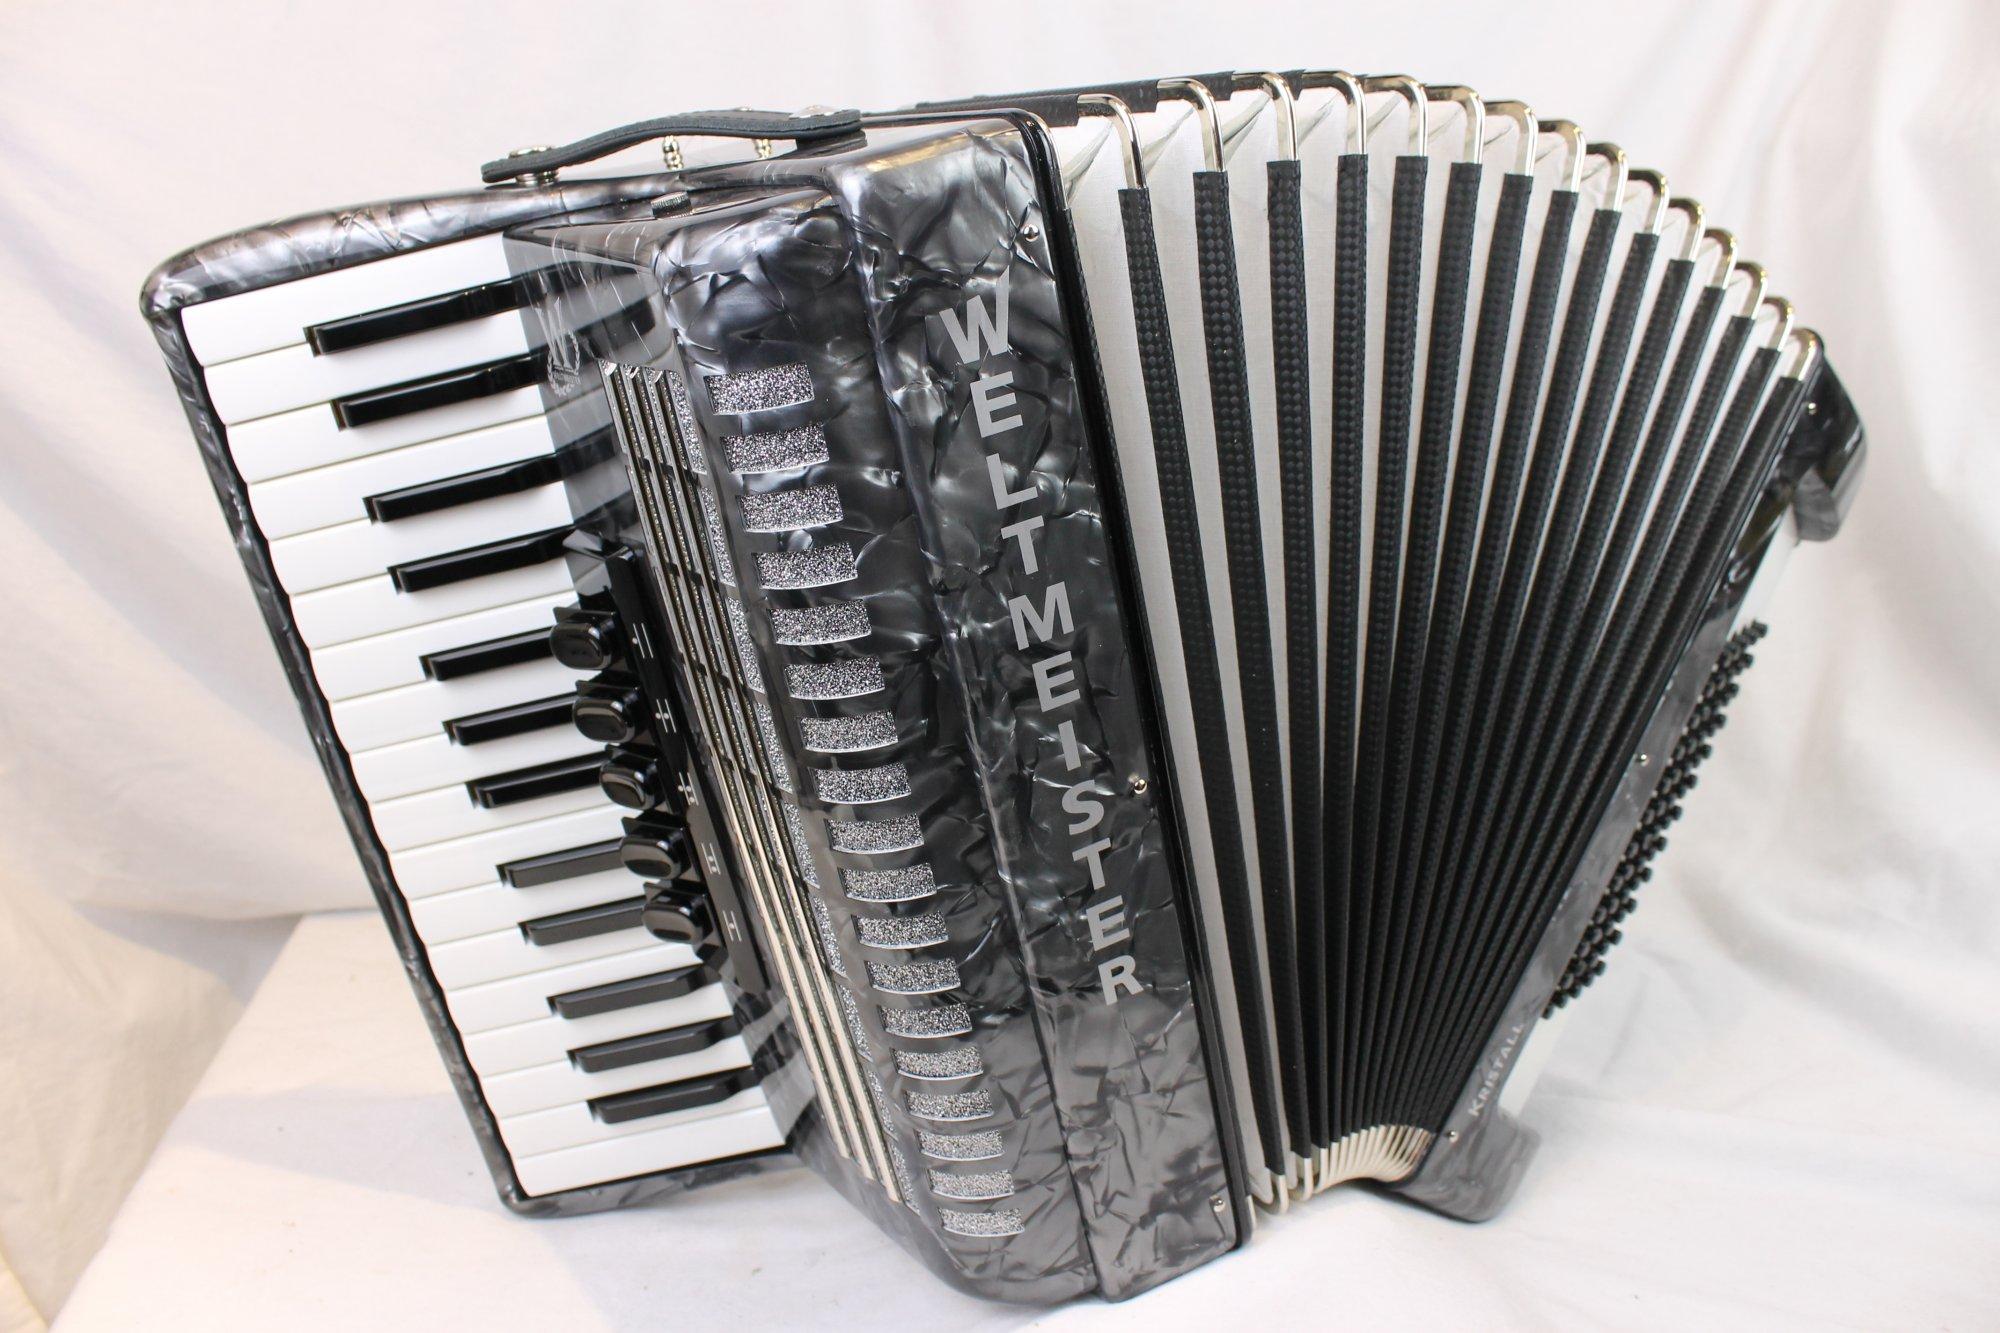 NEW Slate Weltmeister Kristall Piano Accordion LMM 30 60